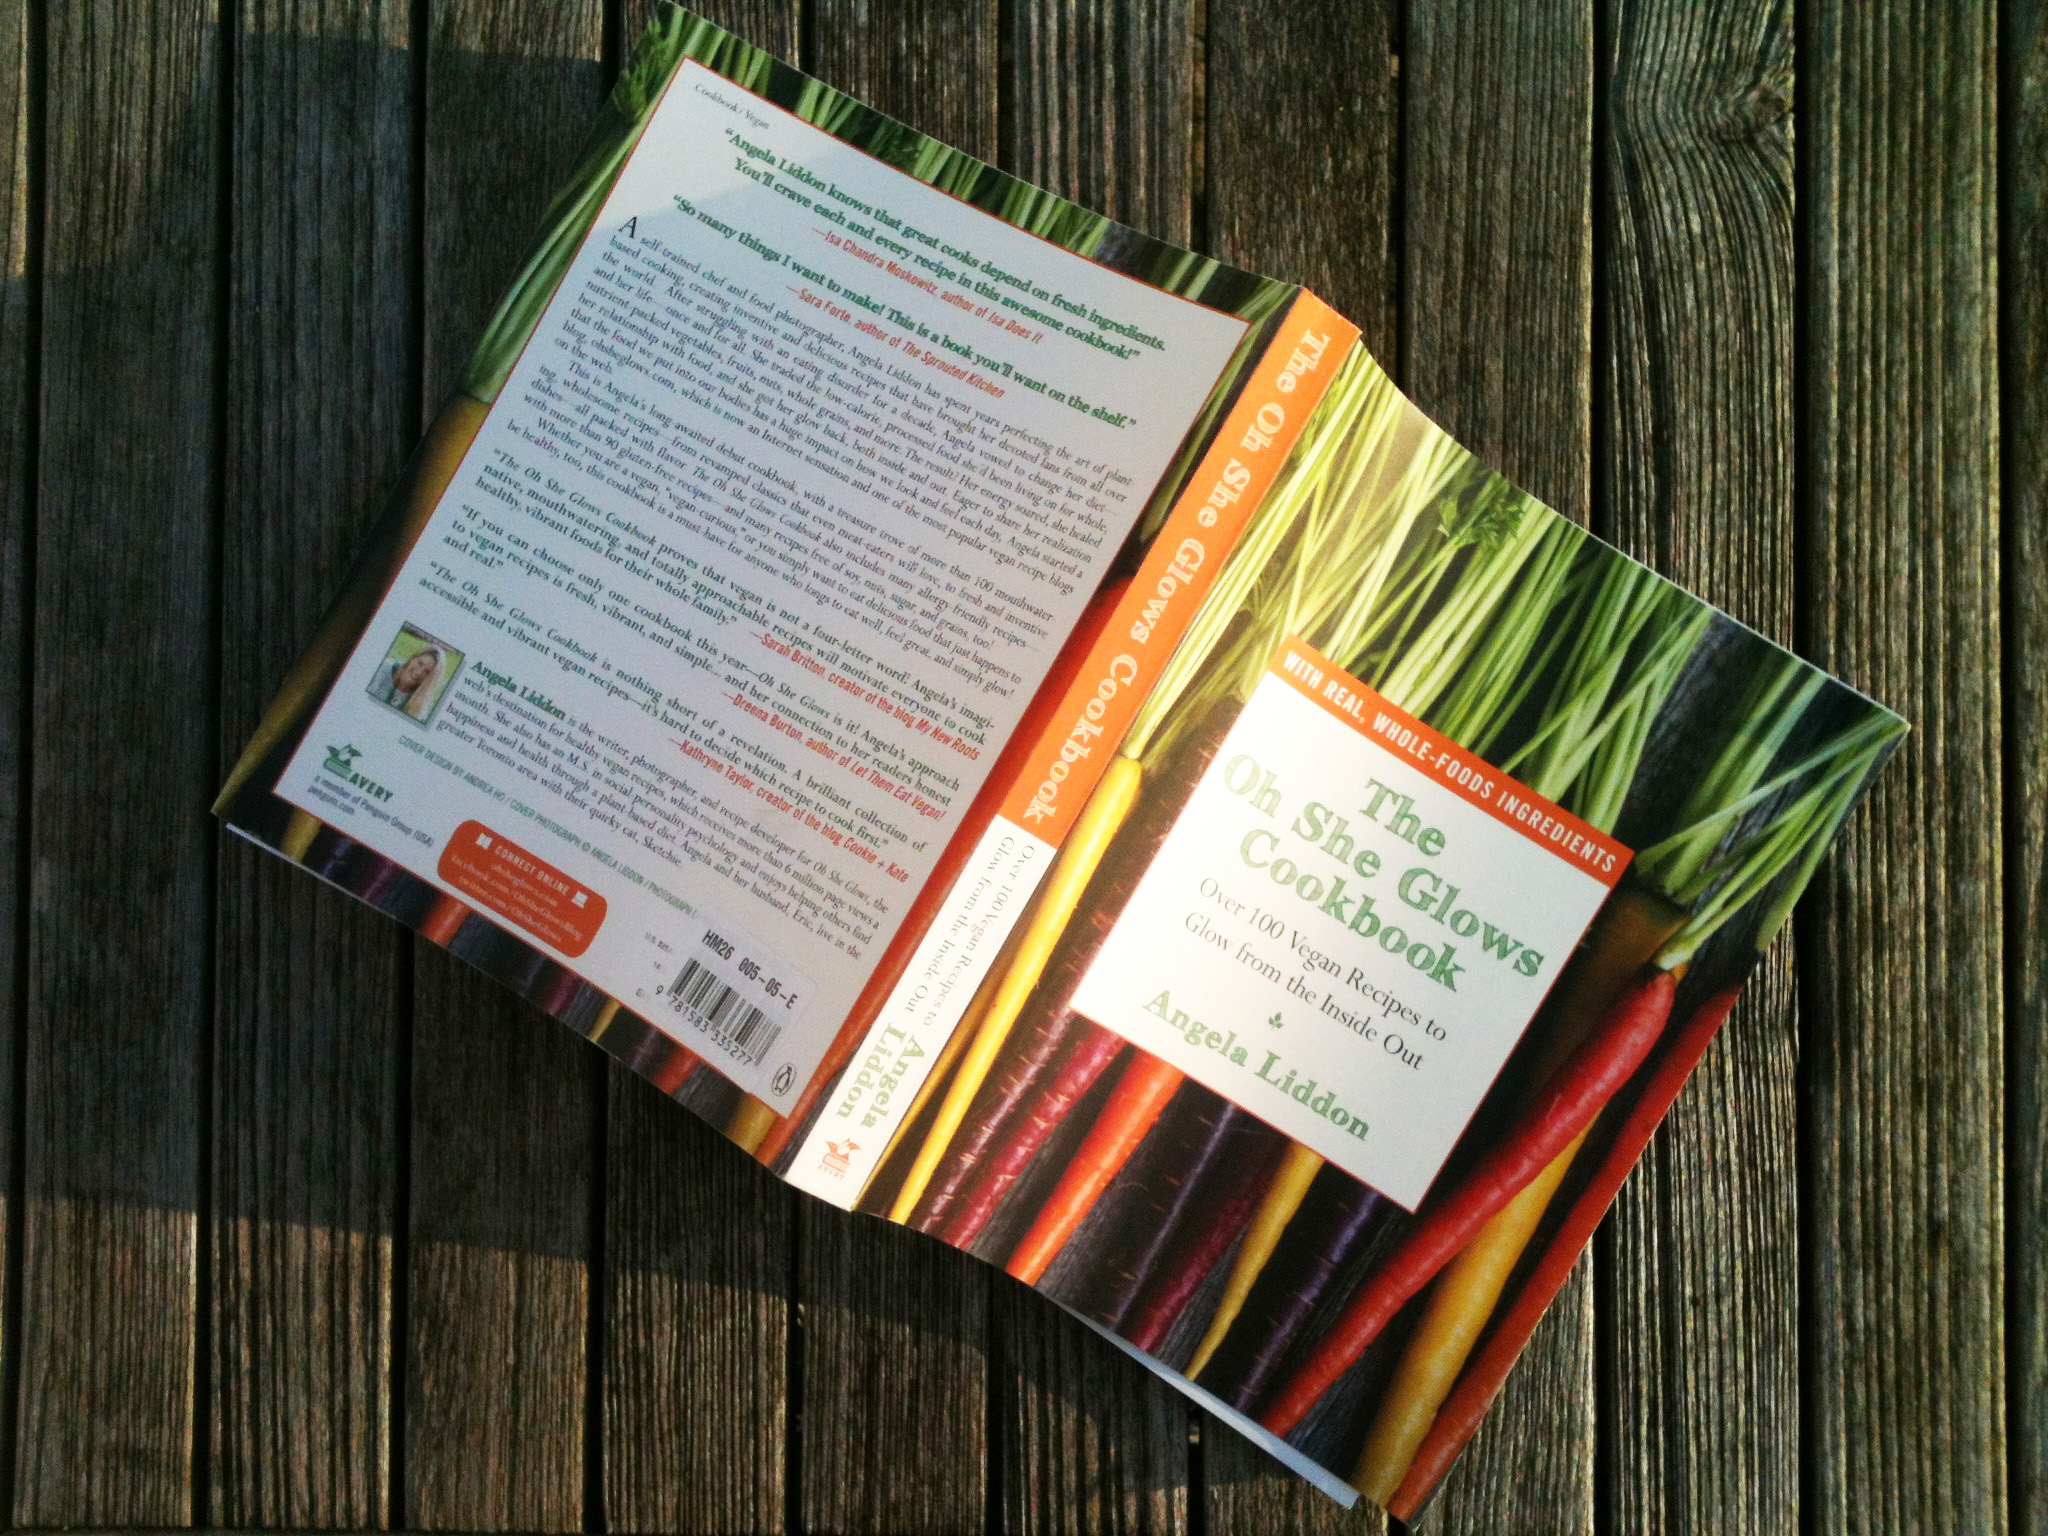 Ohsheglows-cookbook-15.jpg